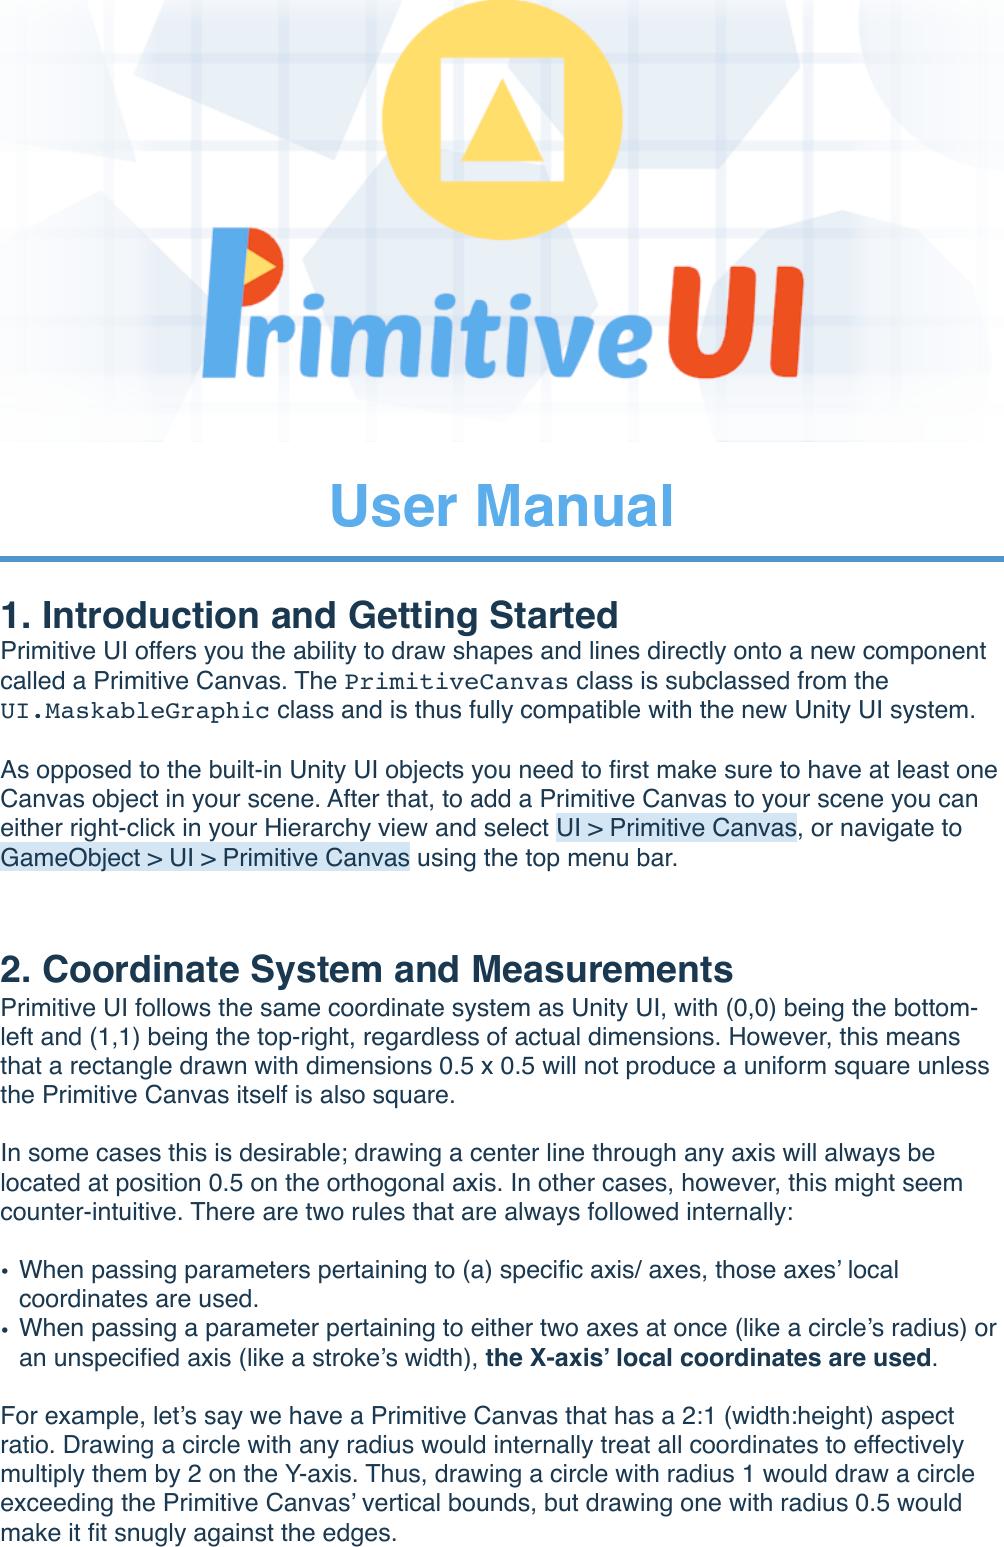 Primitive UI User Manual